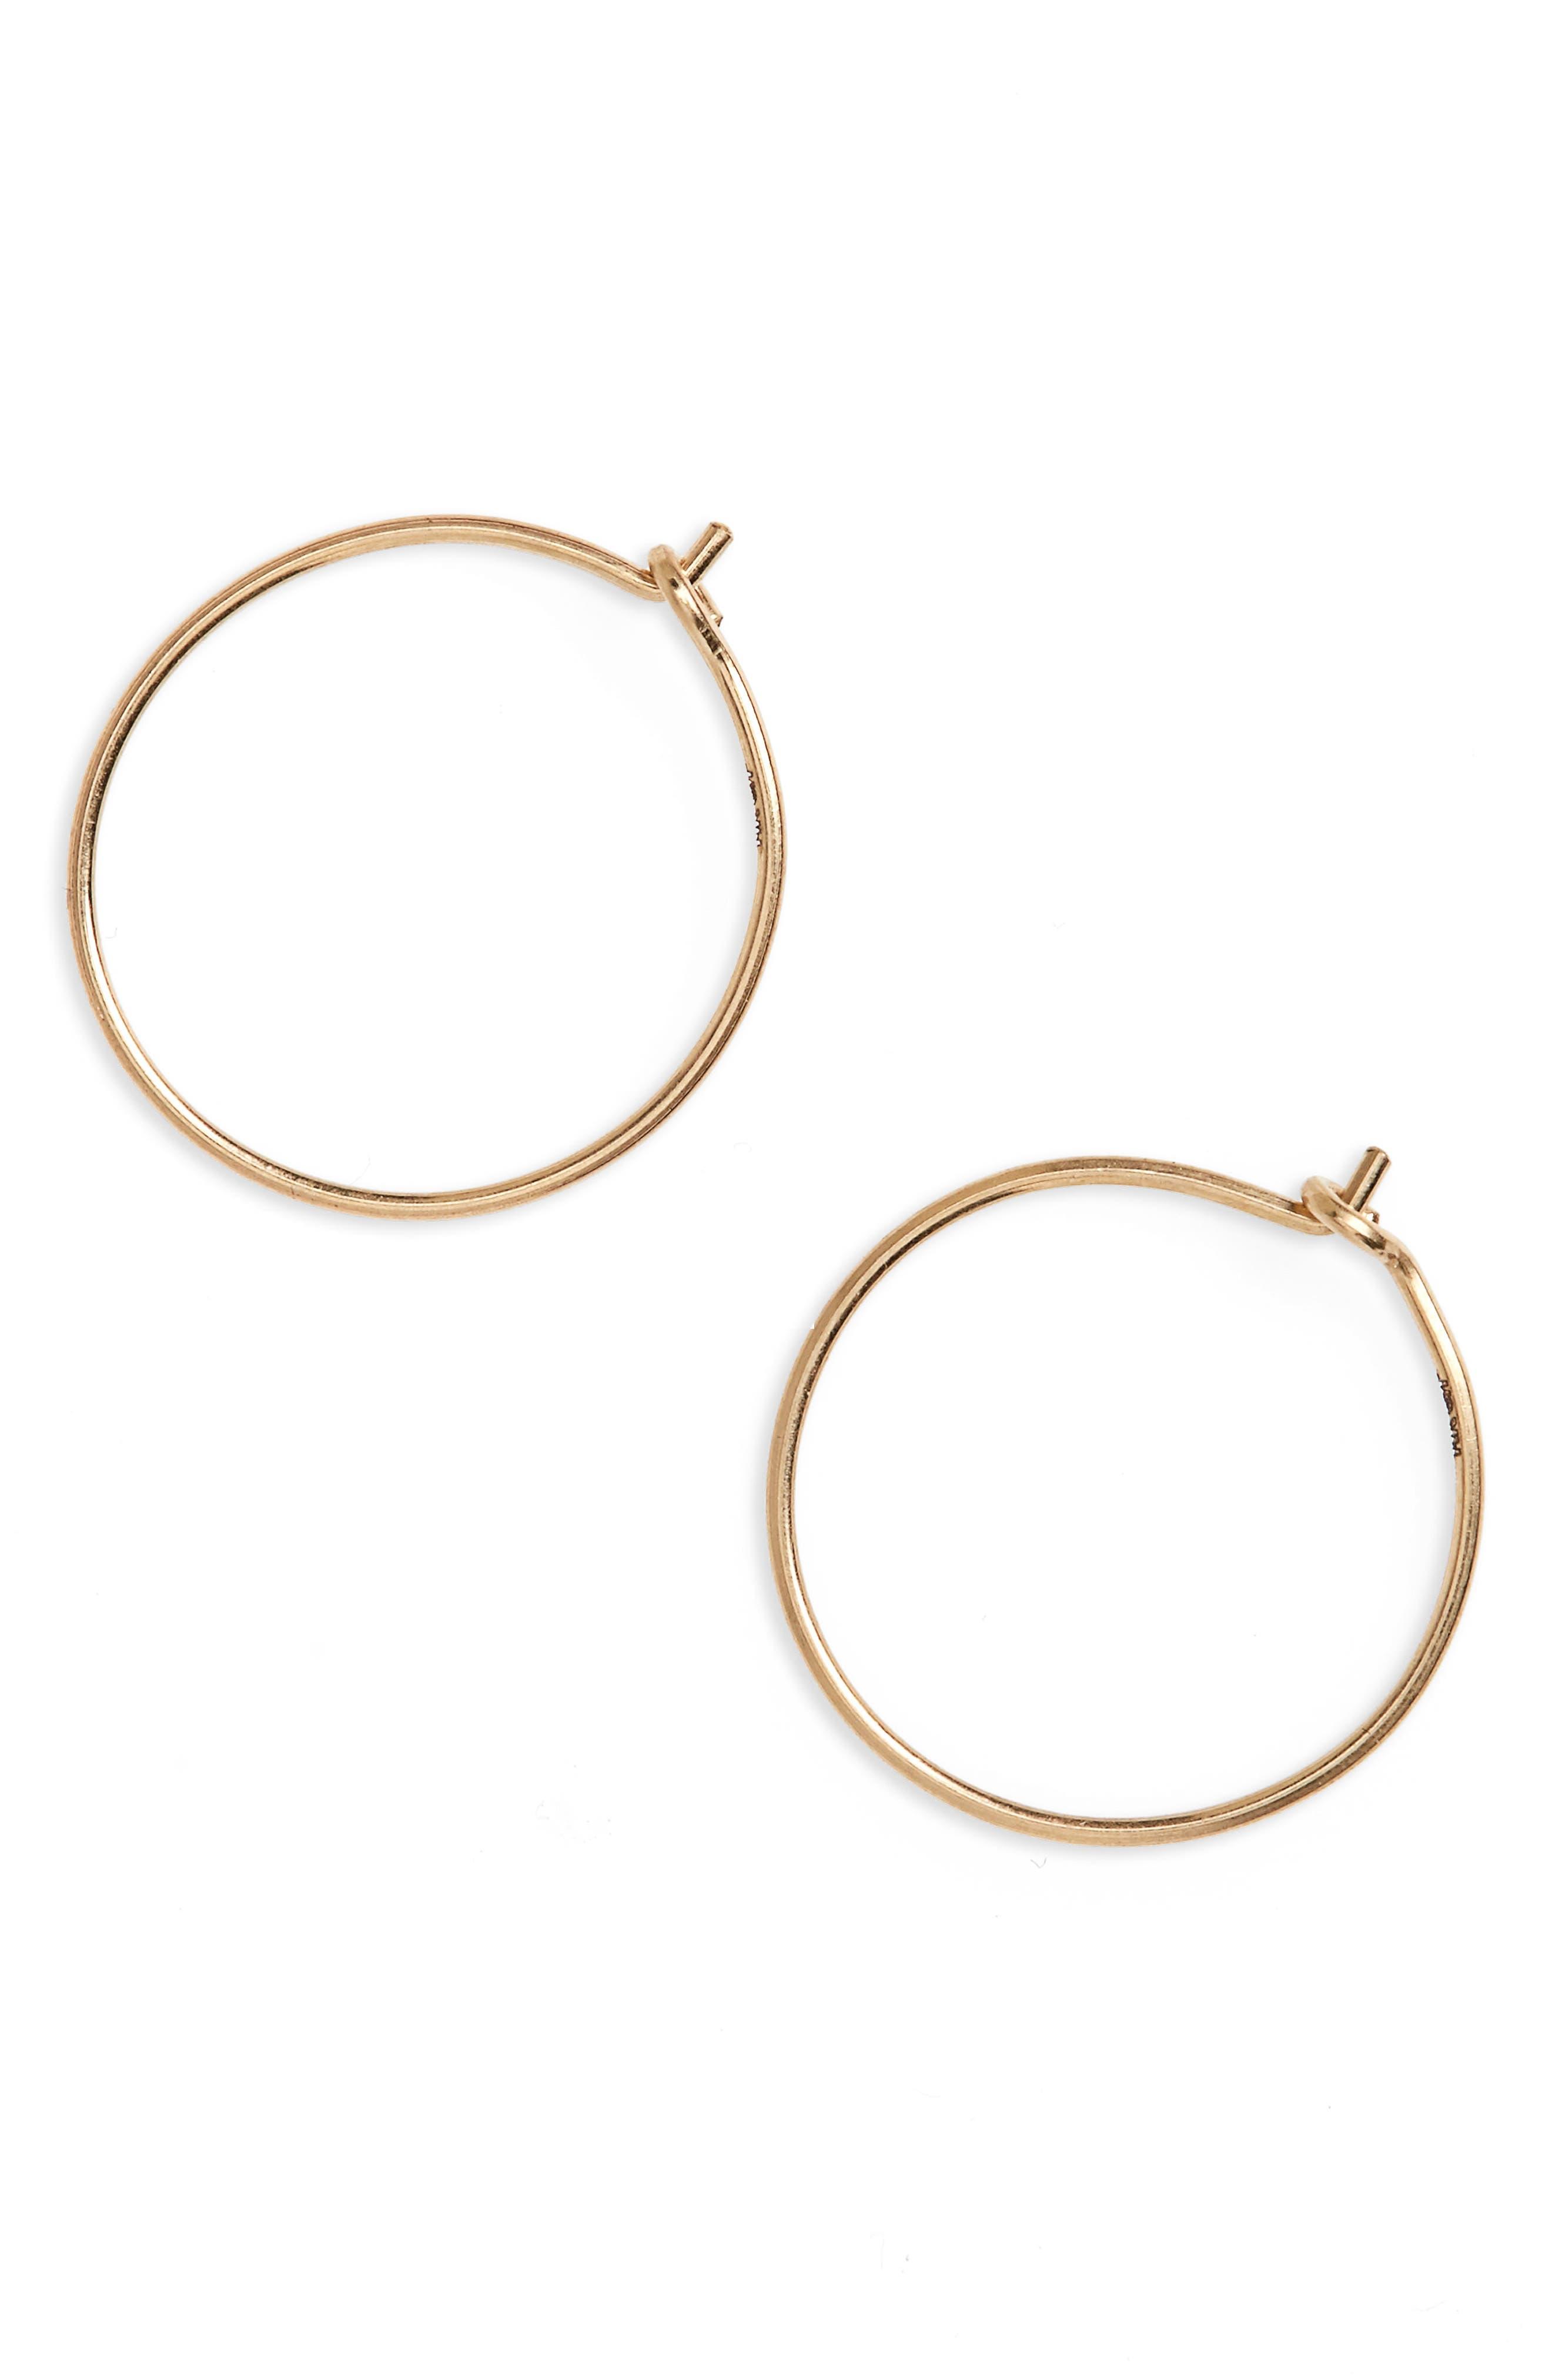 Delicate Wire Hoop Earrings